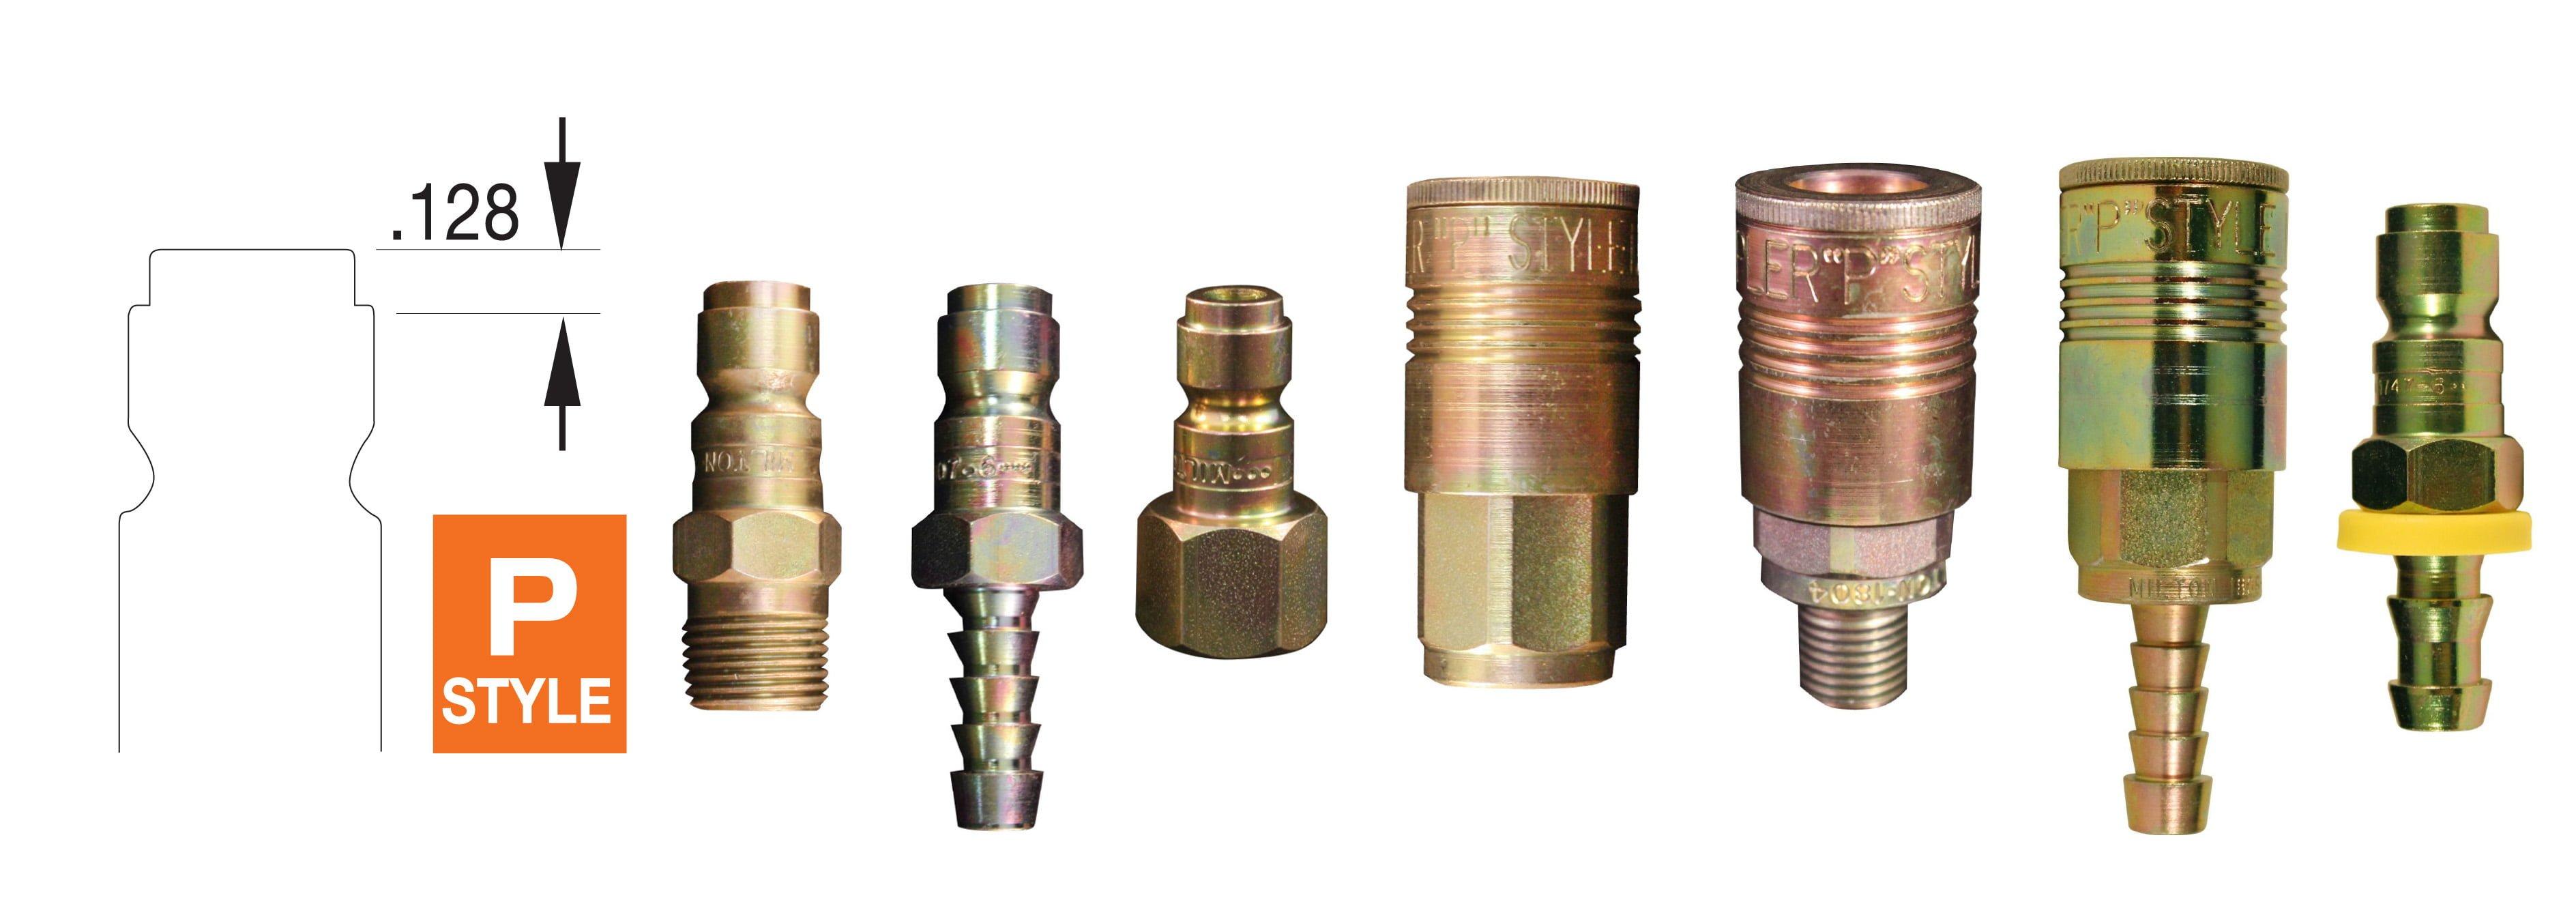 "Milton 1809 1//4/"" NPT P Style Male Plug Set Of 5"